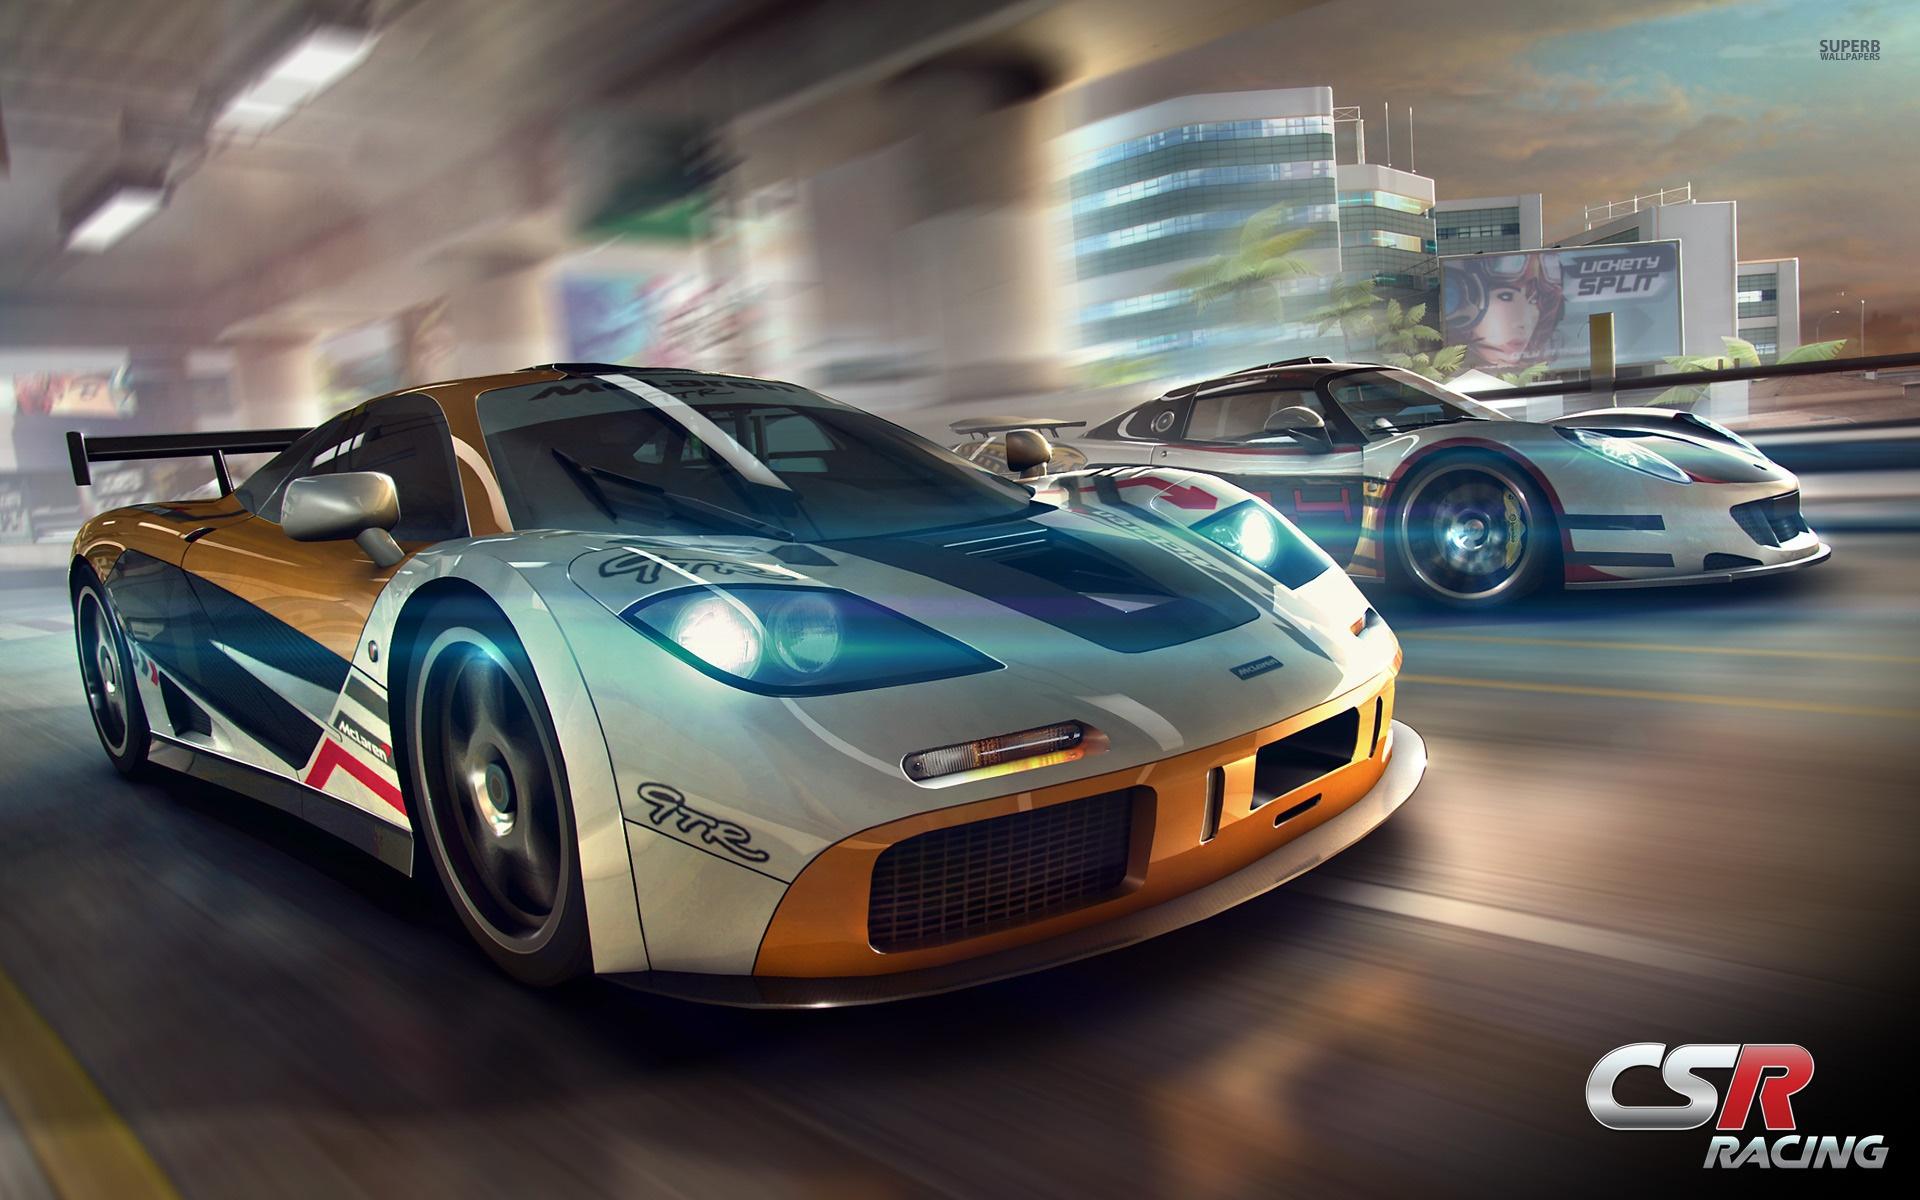 Cheat Hack CSR Racing v3.3.0 Unlimited Gold Money